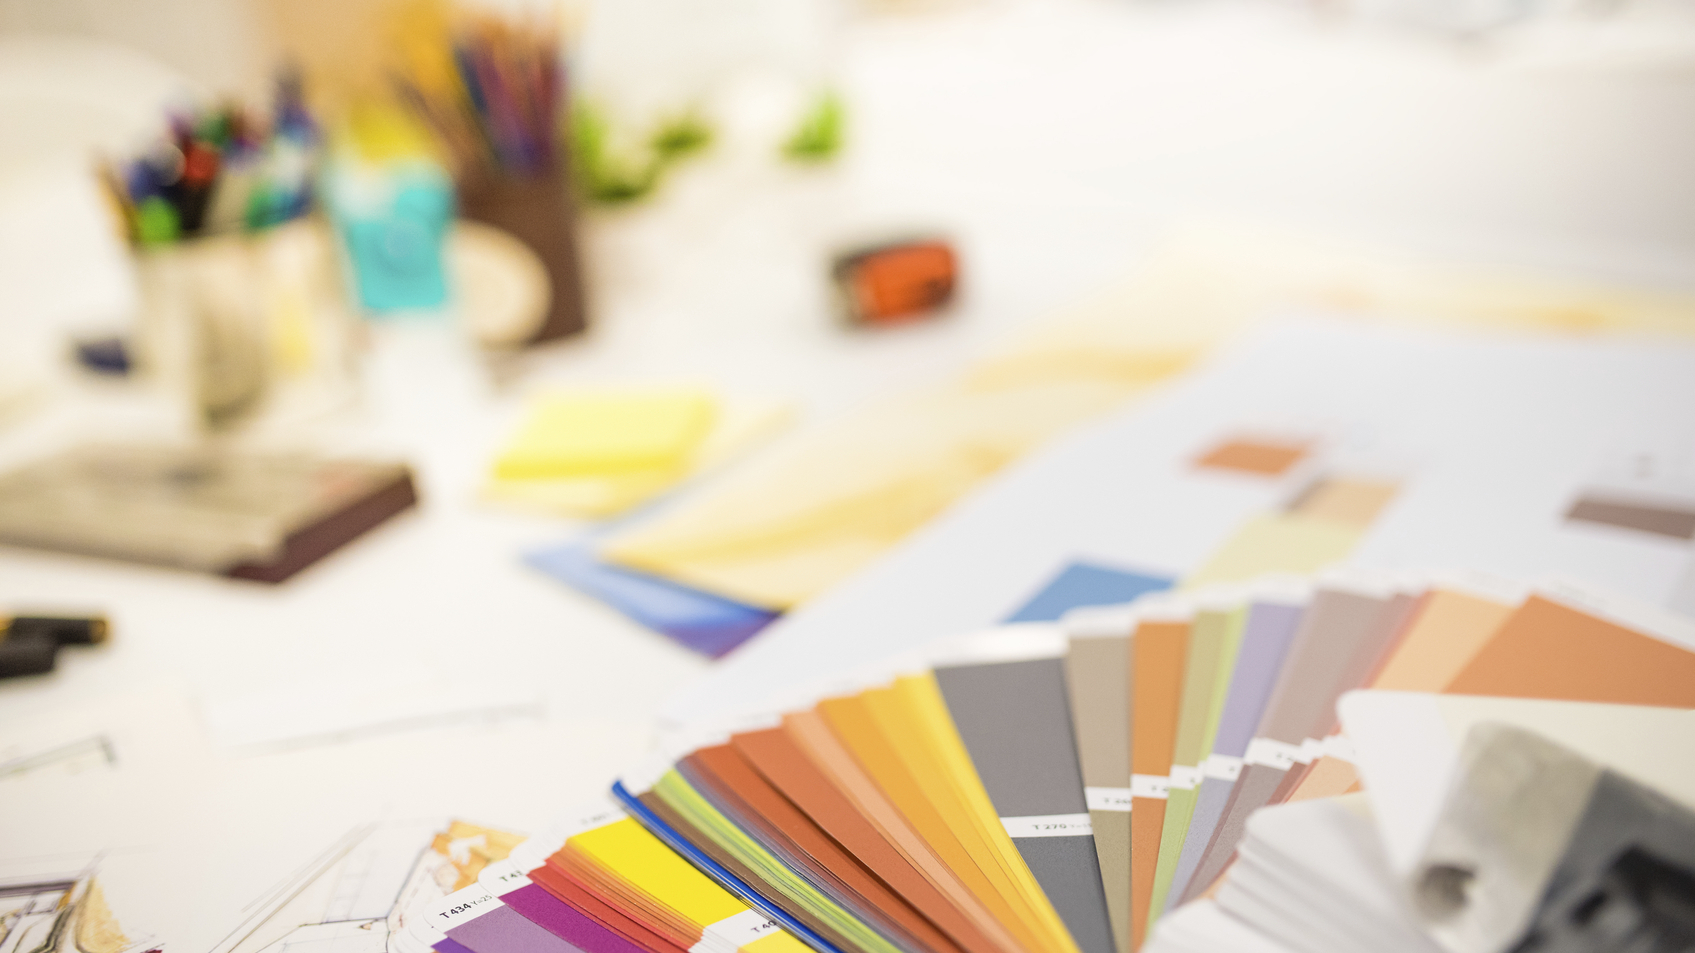 Color swatch on designers desk